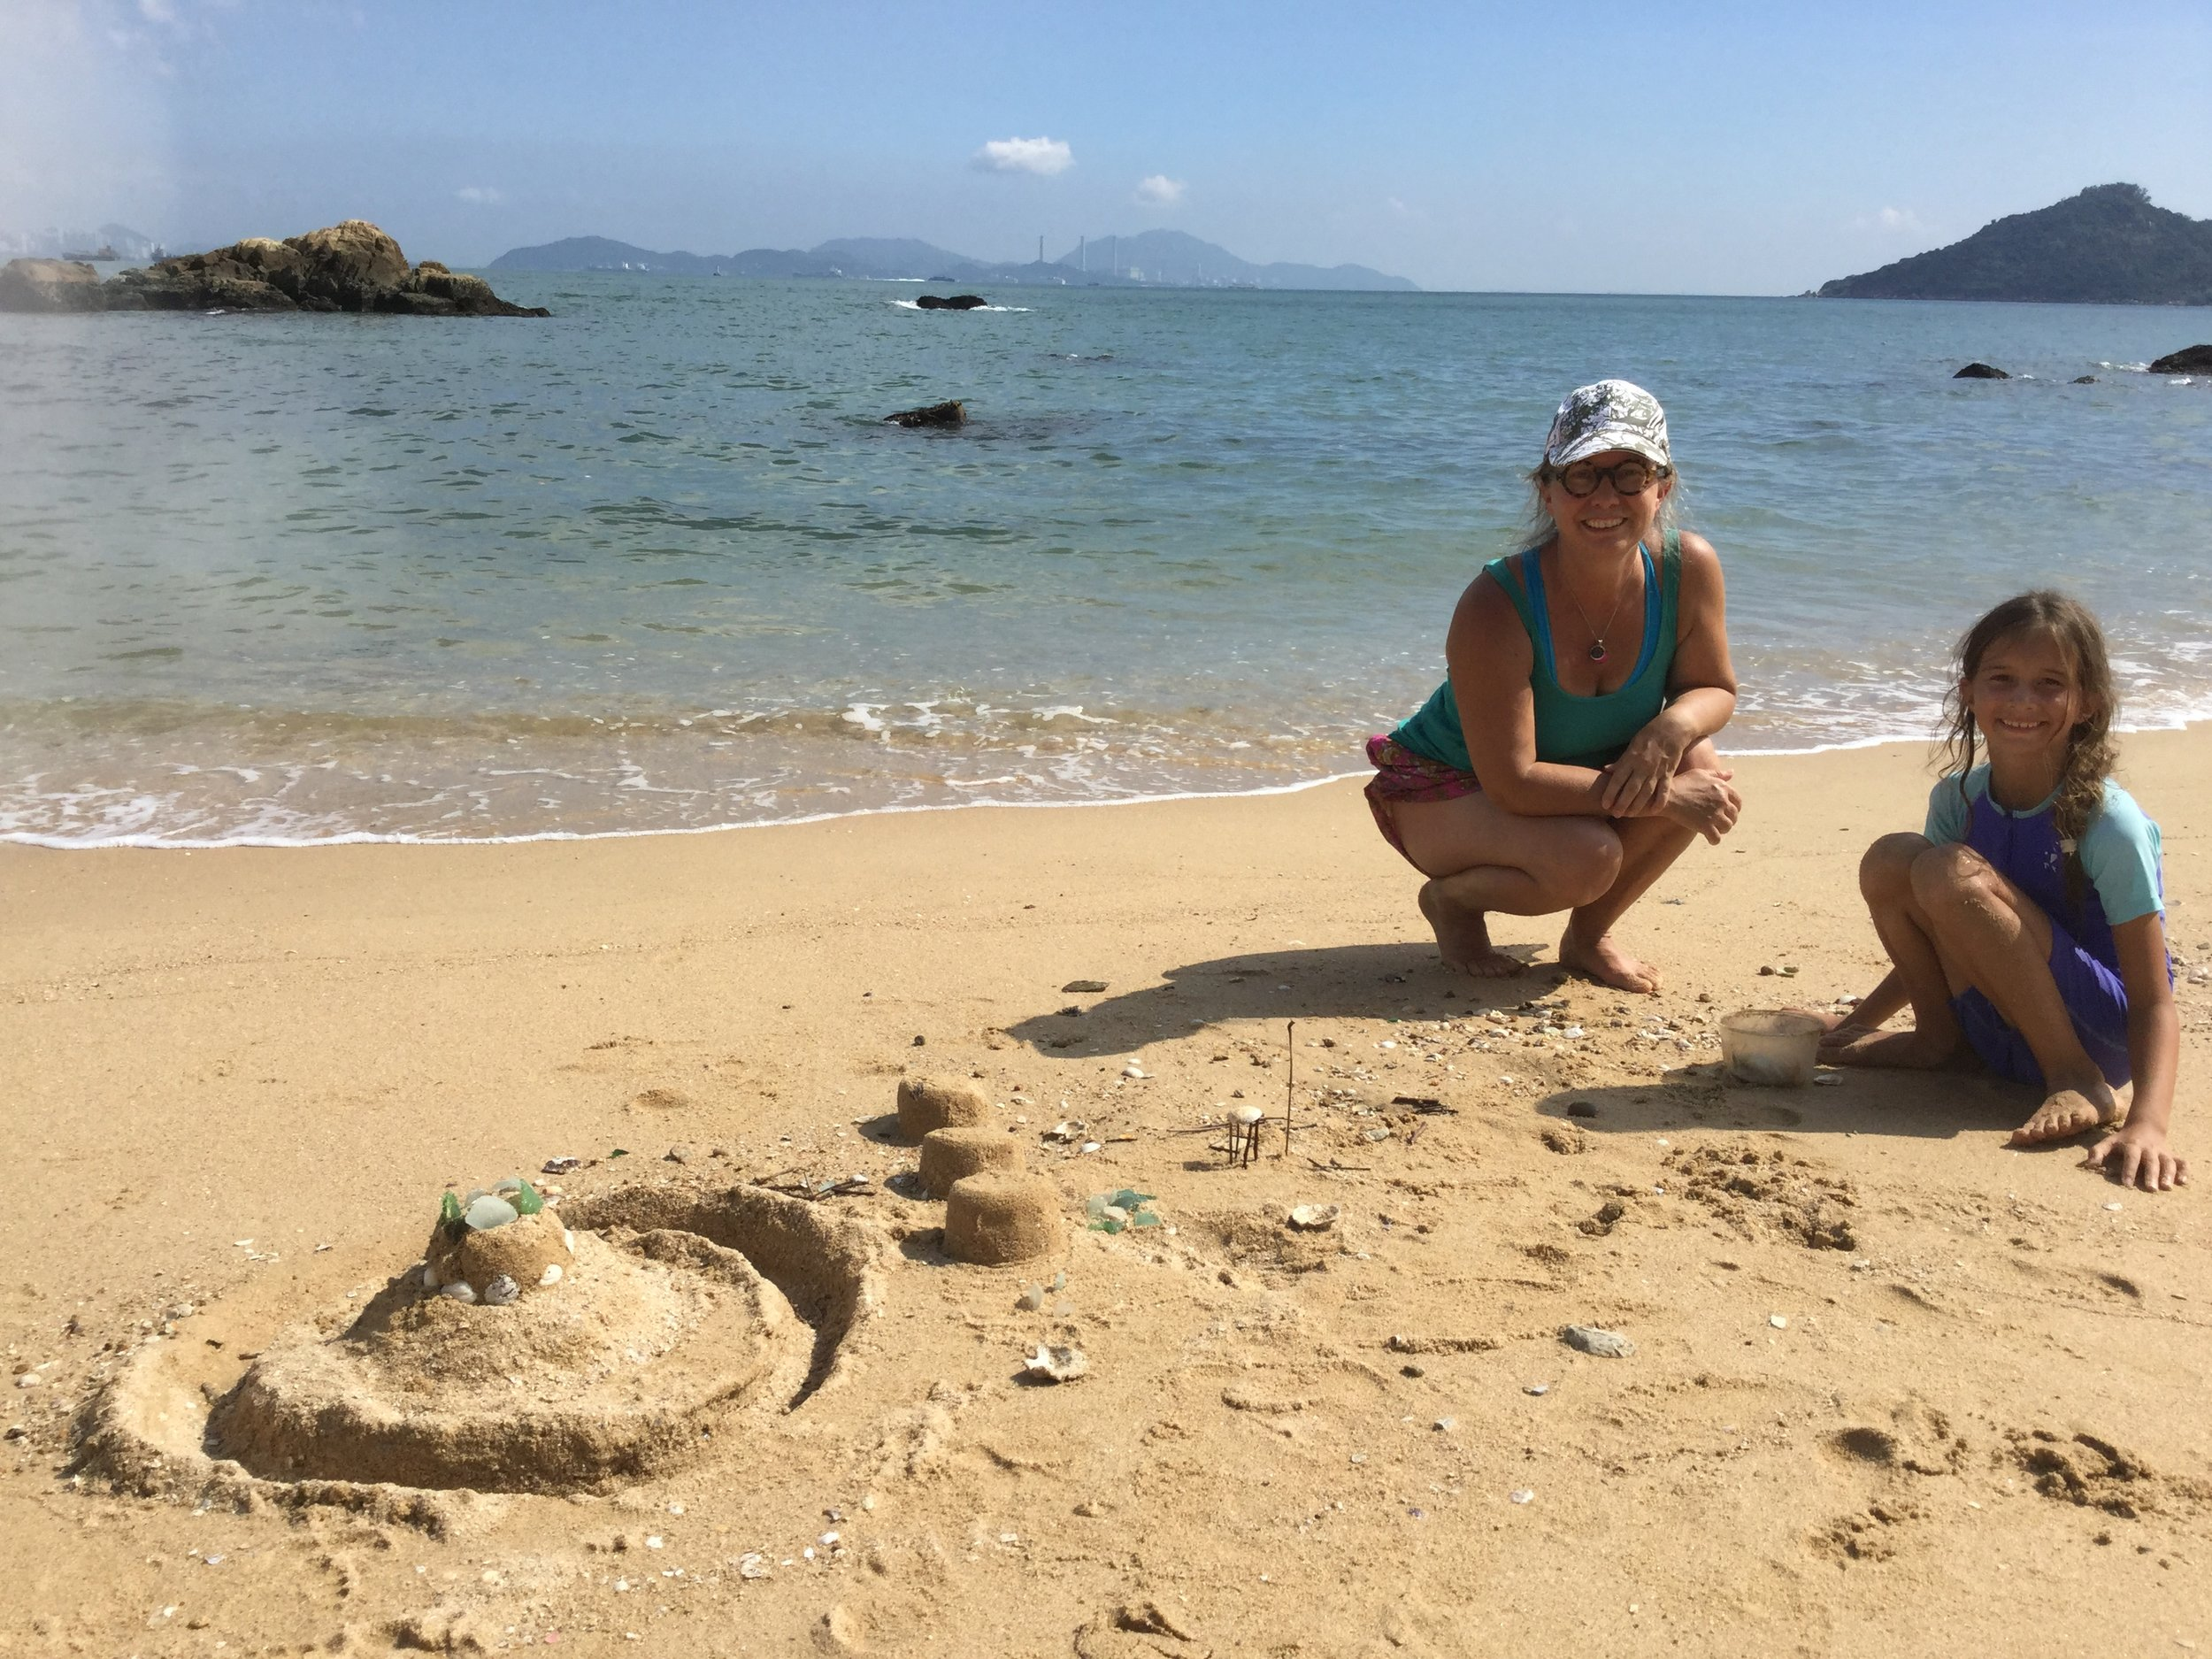 Seashells, glass bits, sticks and sand castles.